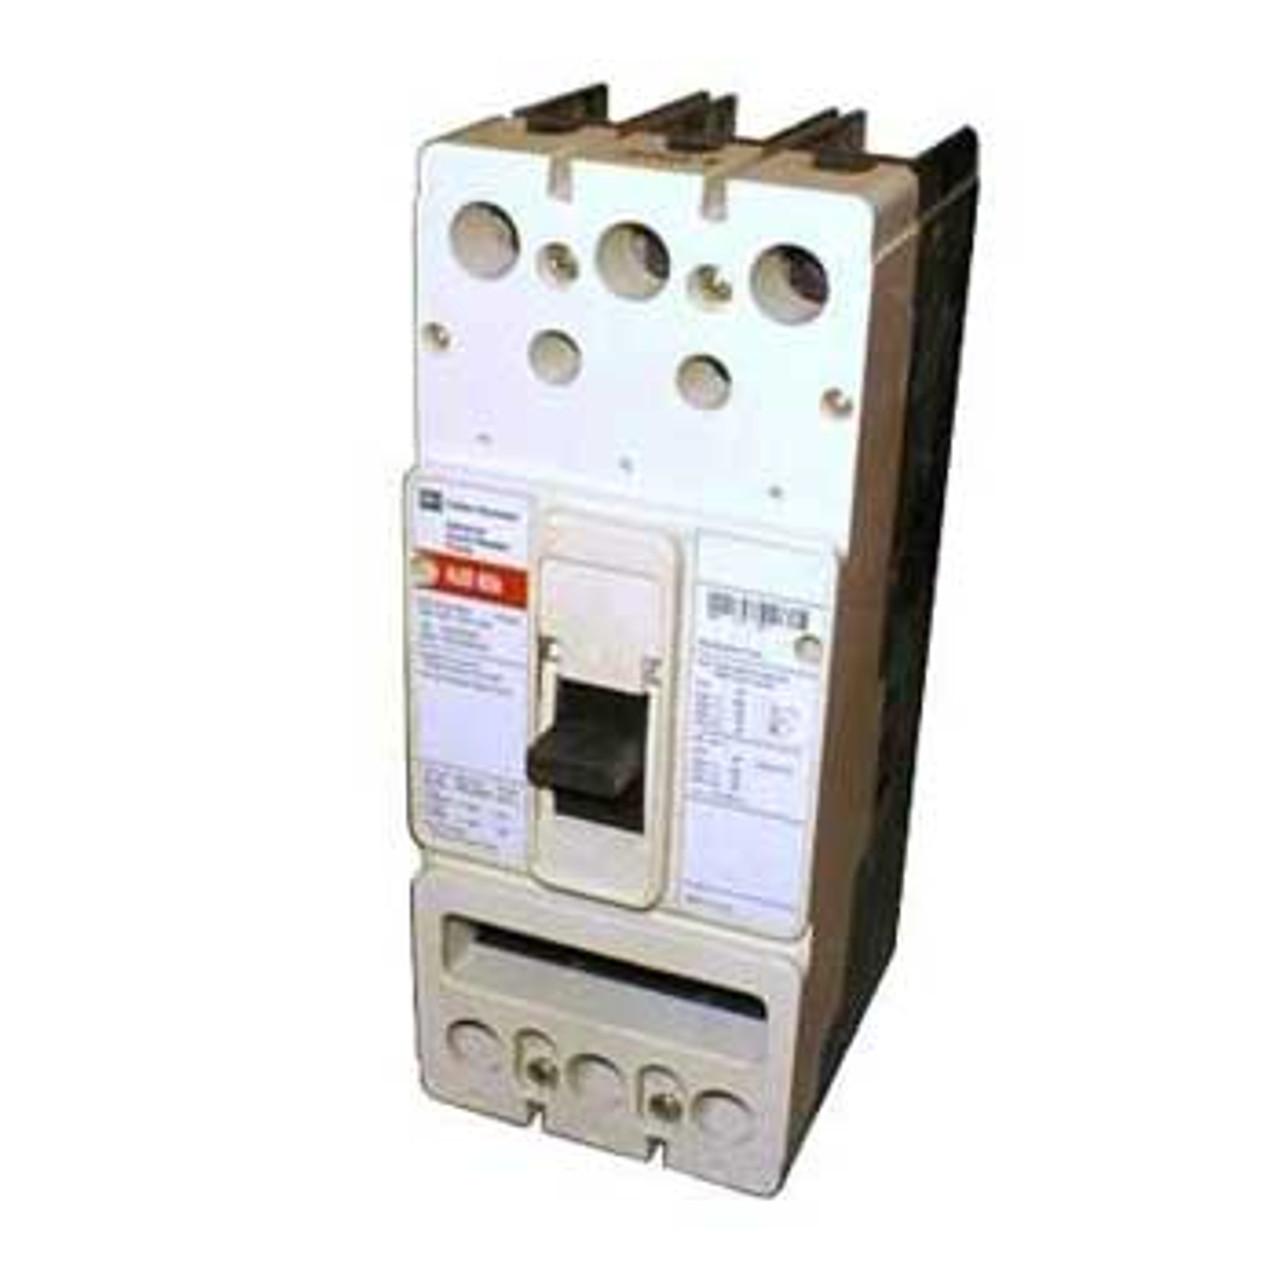 Westinghouse JD3250 3 Pole 250A 600VAC 125A Trip Circuit Breaker - Used